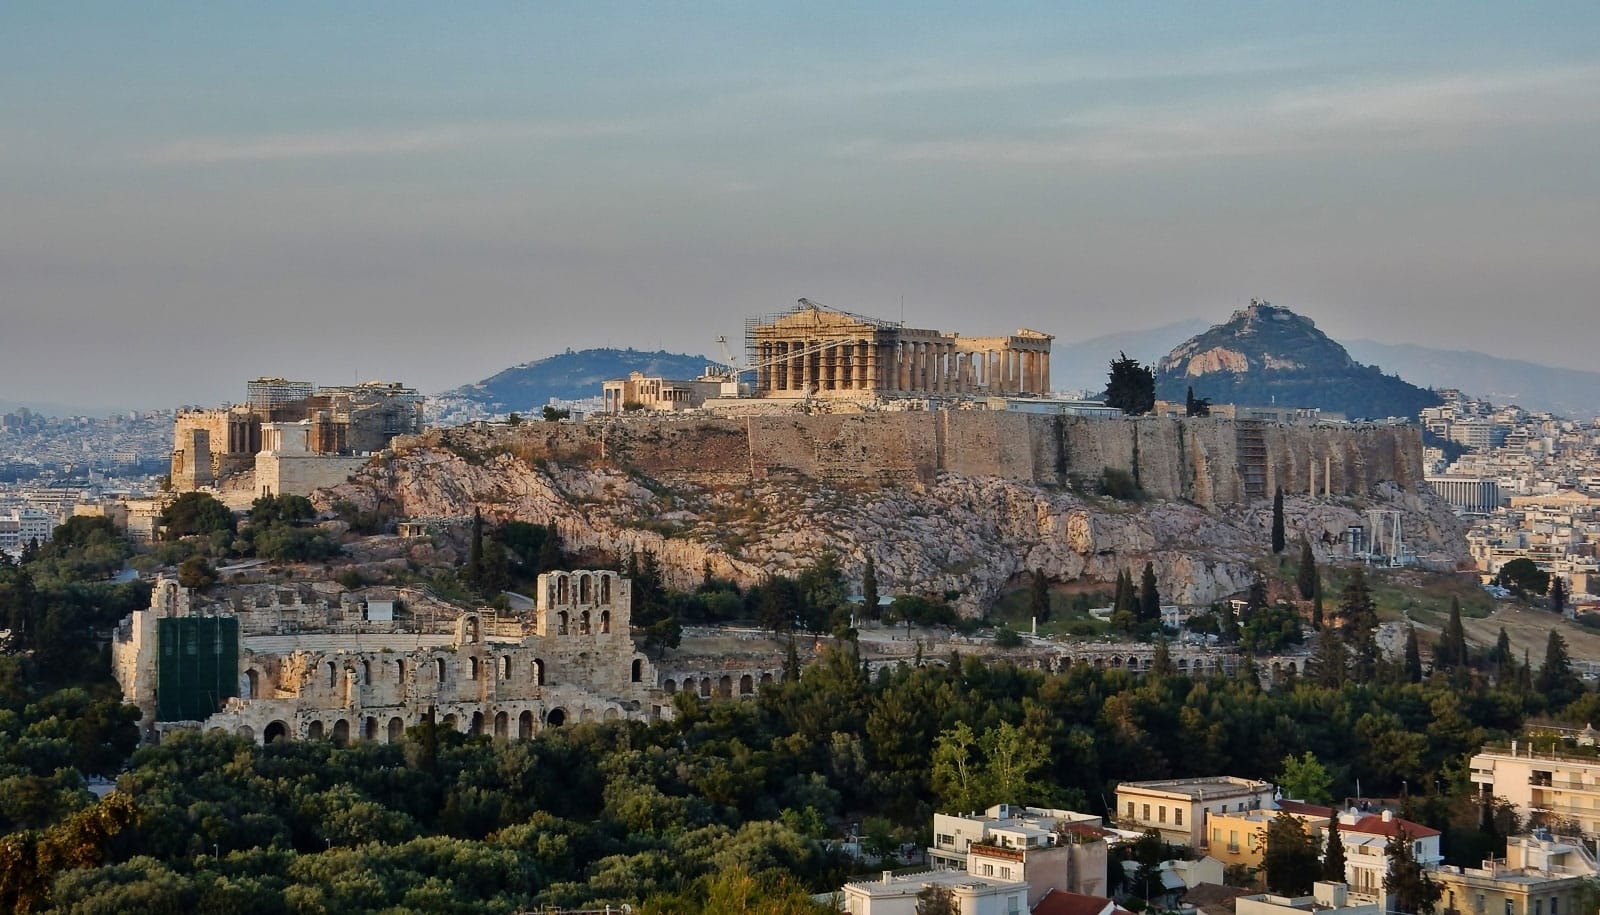 View of the Acropolis - by piet theisohn